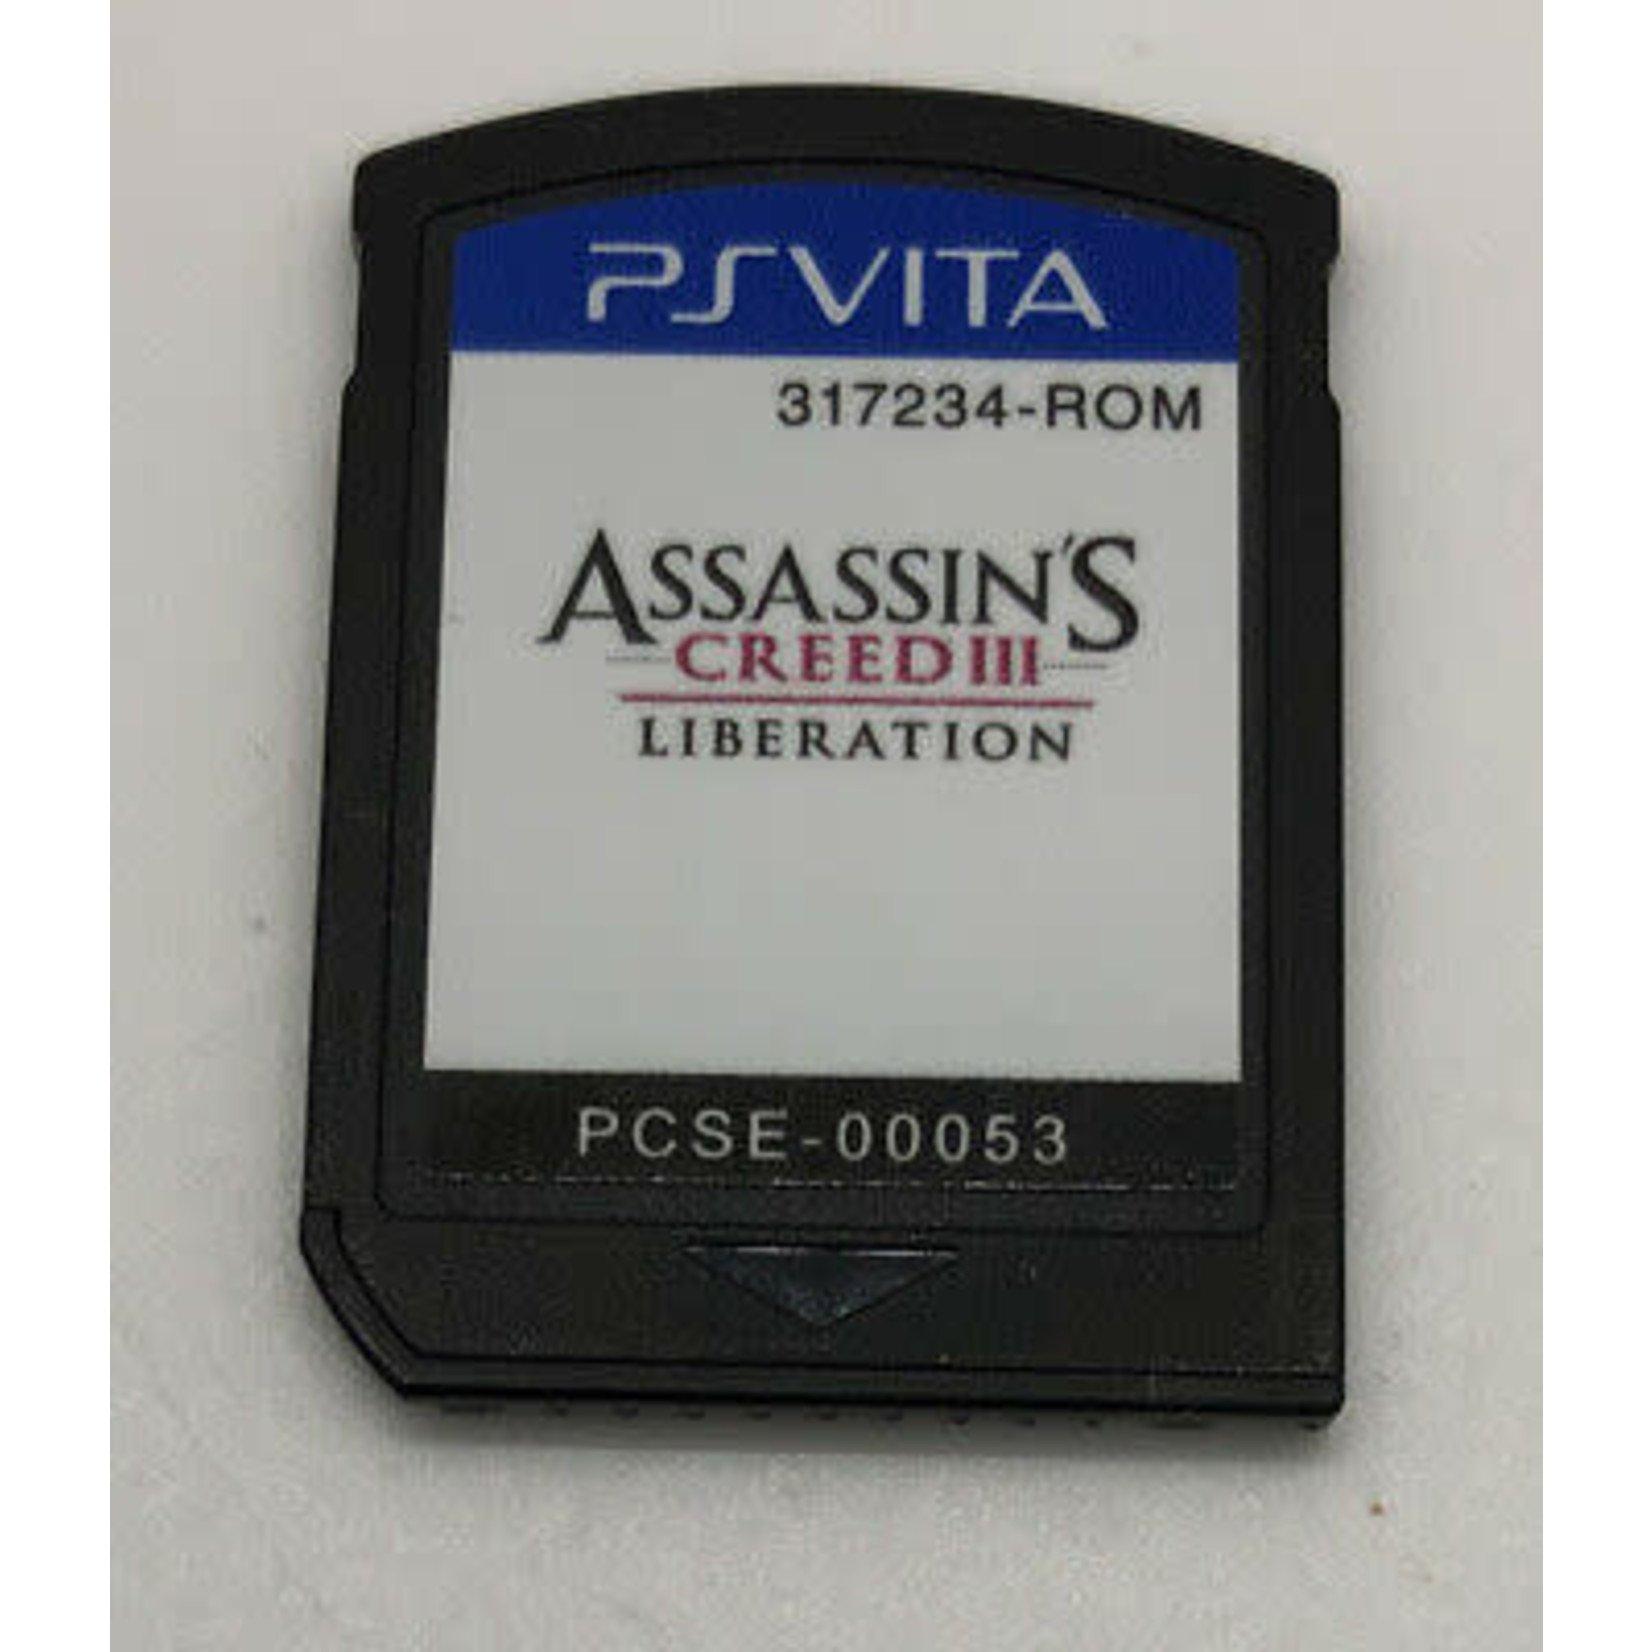 vitau-Assassins Creed III Liberation (chip only)